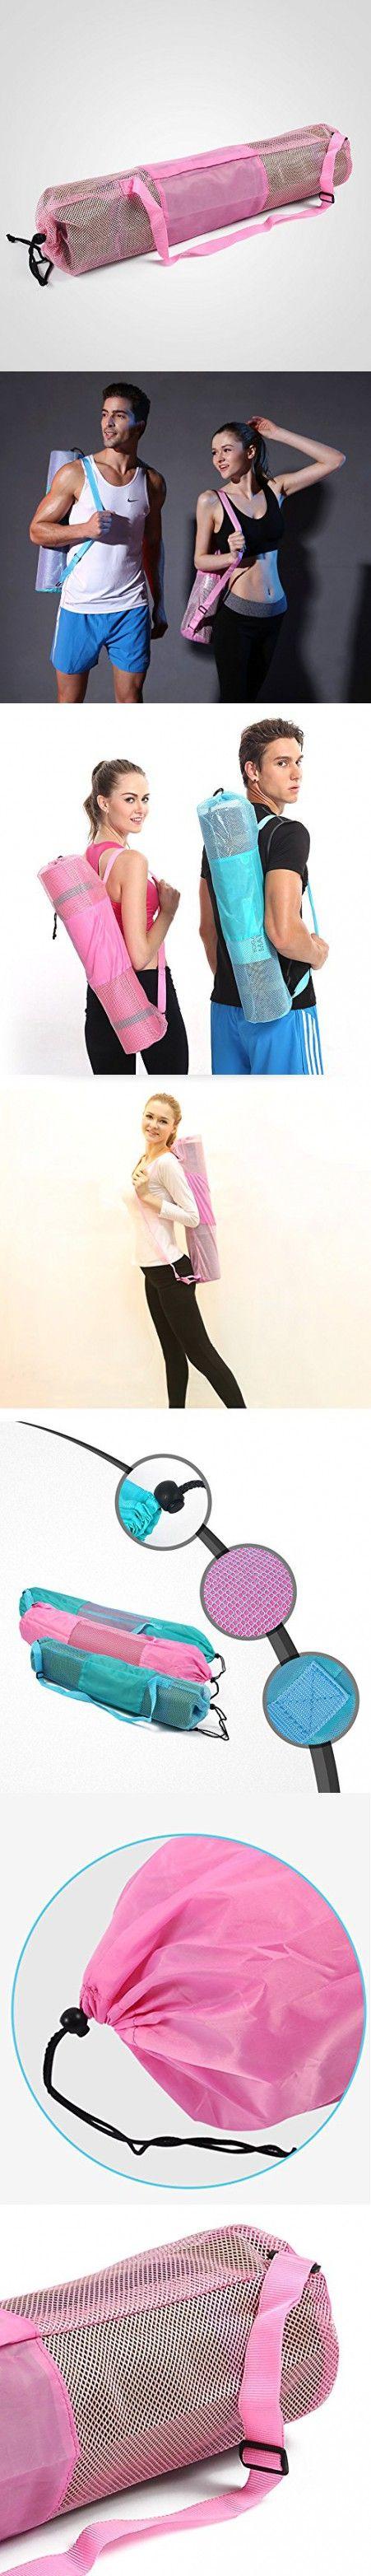 Multiple Size Nylon Yoga Mat Bag Adjustable Portable Mesh Center Pilates Mat Bag Fitness Carrier for Yoga (Pink, S)